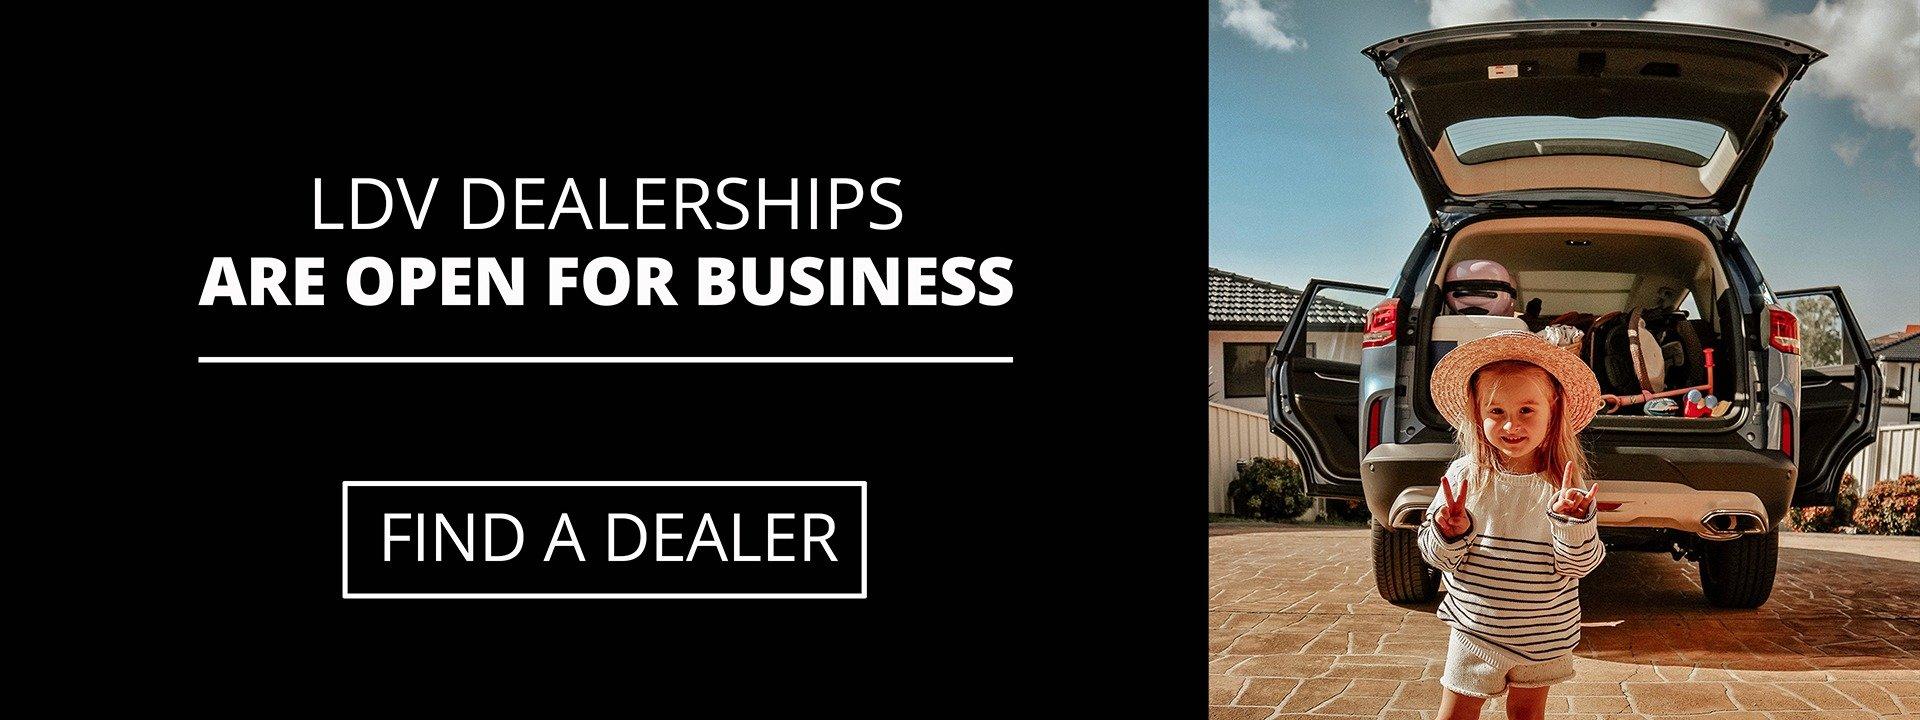 LDV Dealerships are open for business